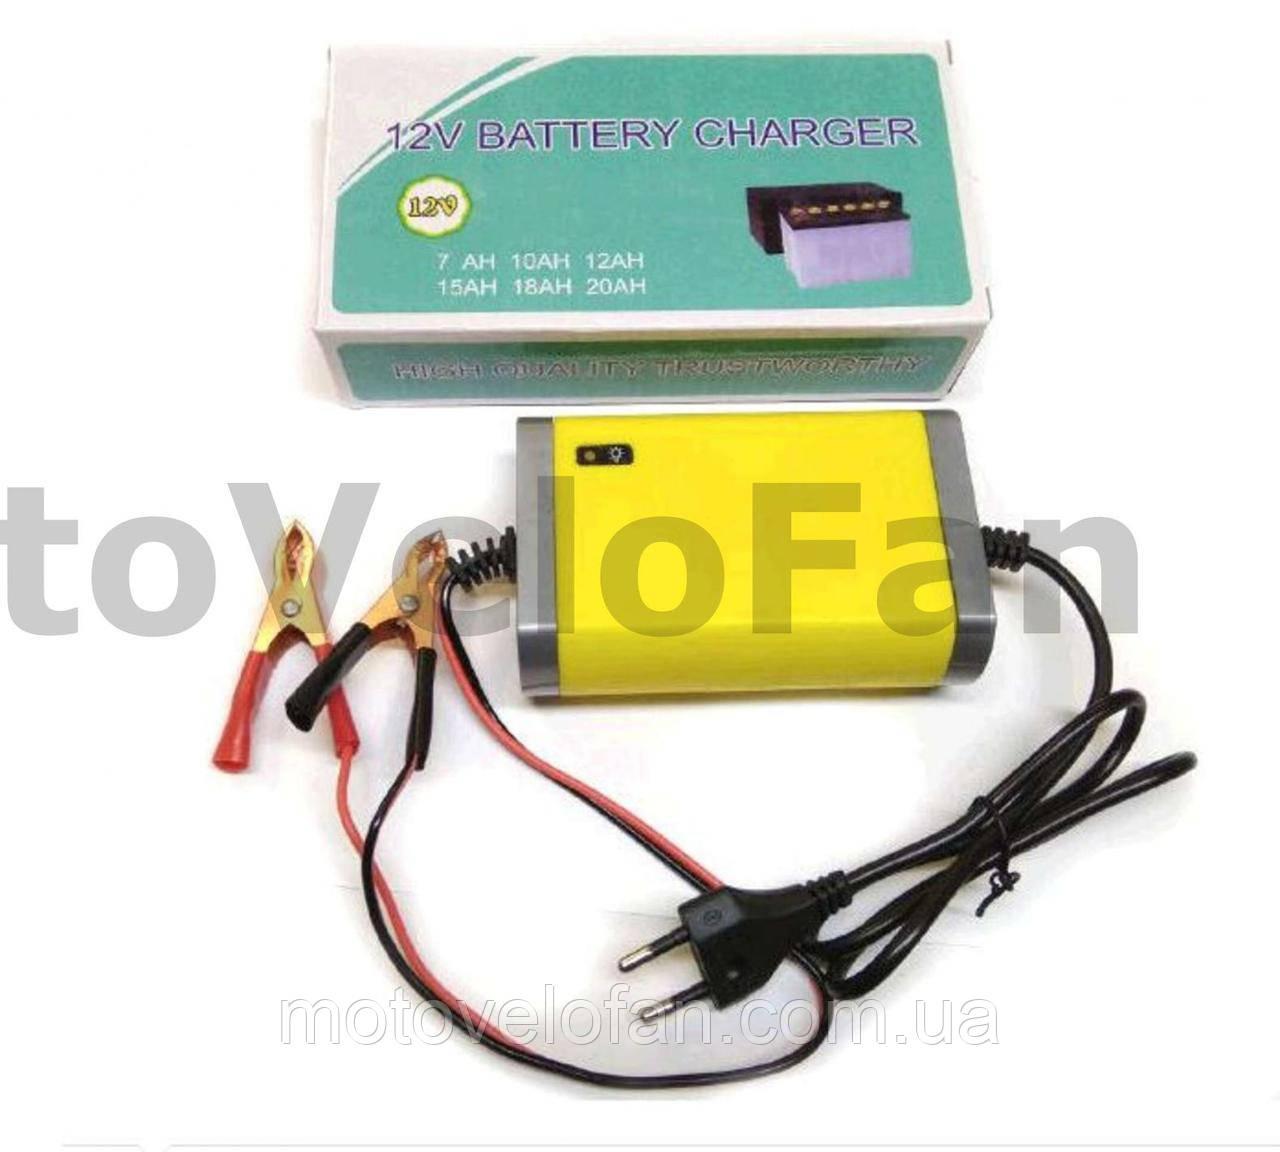 Зарядное устройство для АКБ   12V 2А/ч   DVK